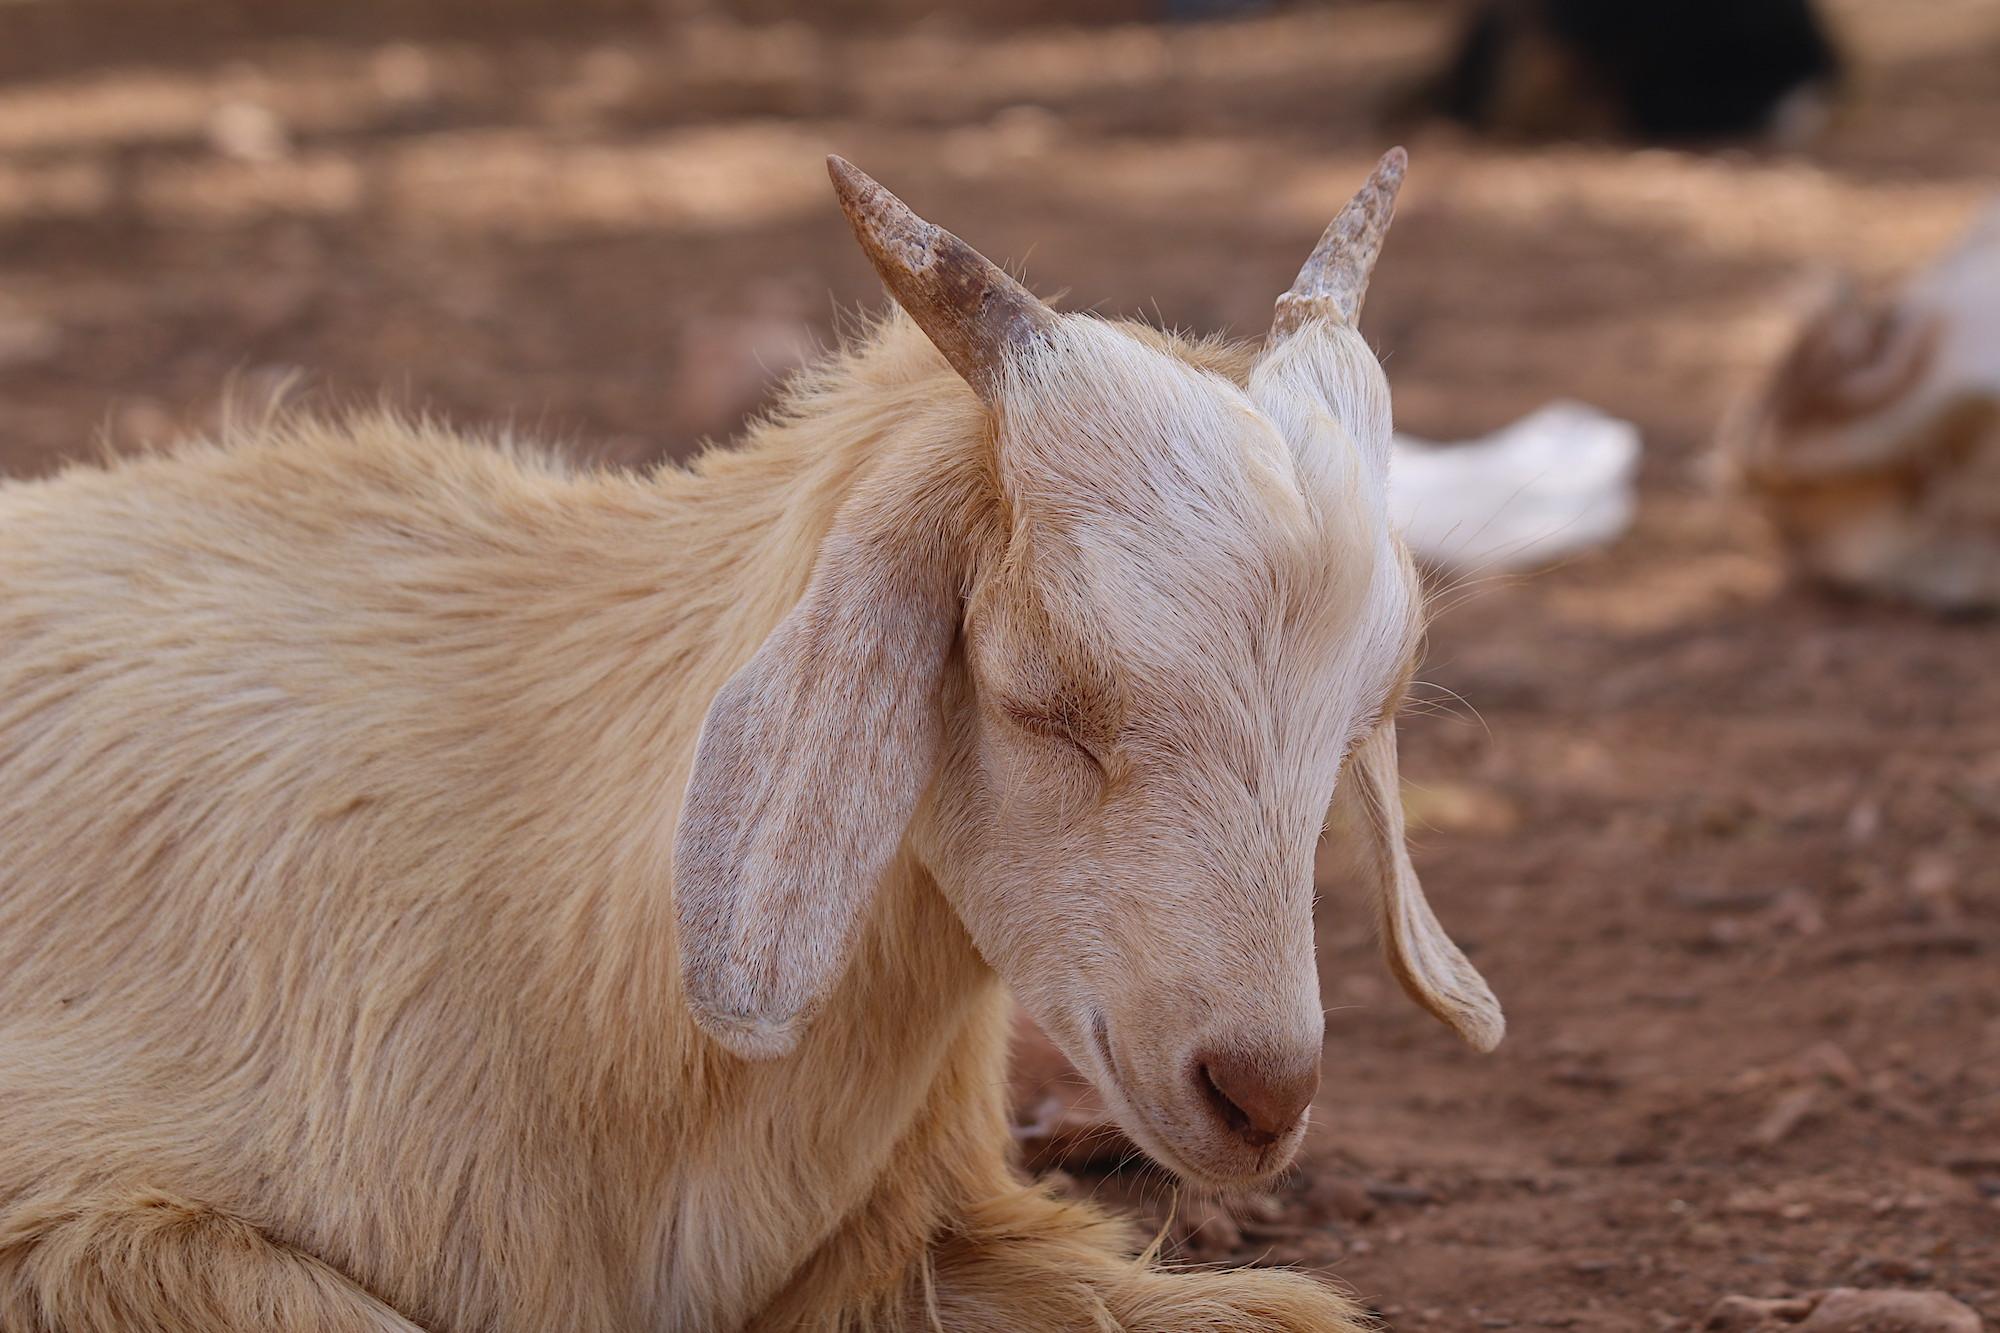 morroco-baby-goat-5.JPG